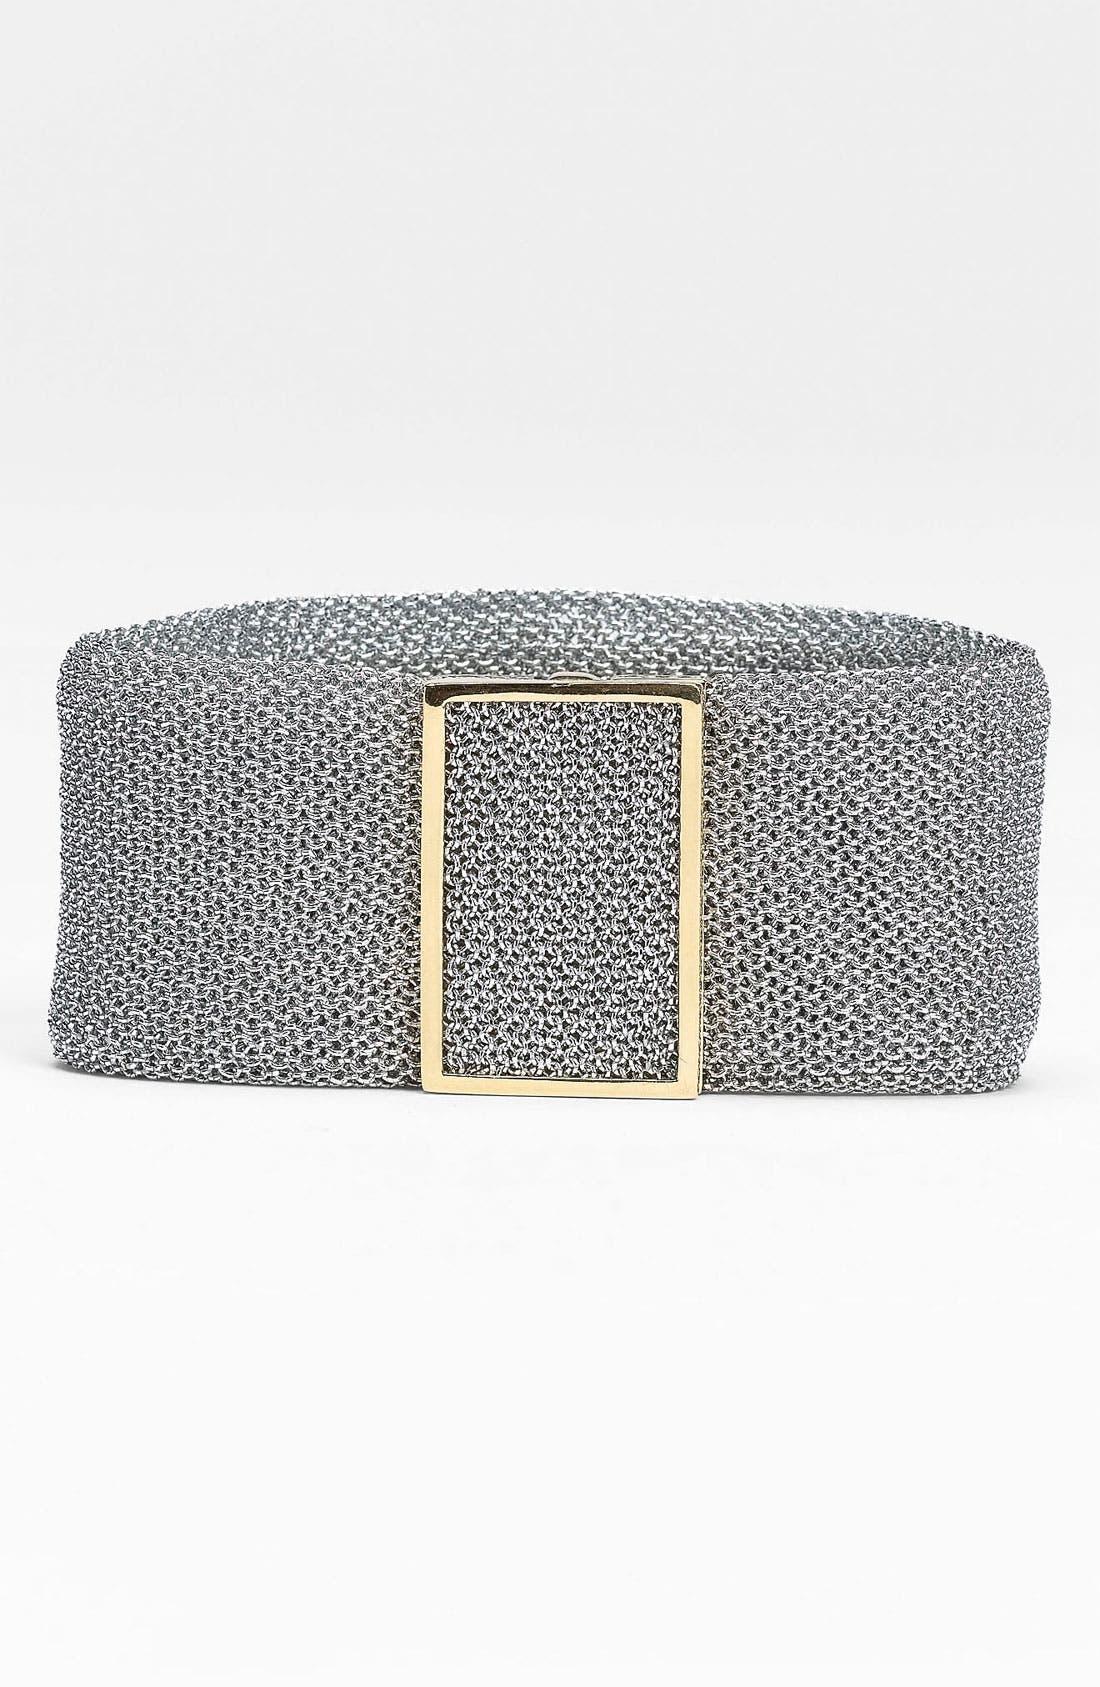 Main Image - Adami & Martucci 'Mesh' Bracelet (Nordstrom Exclusive)